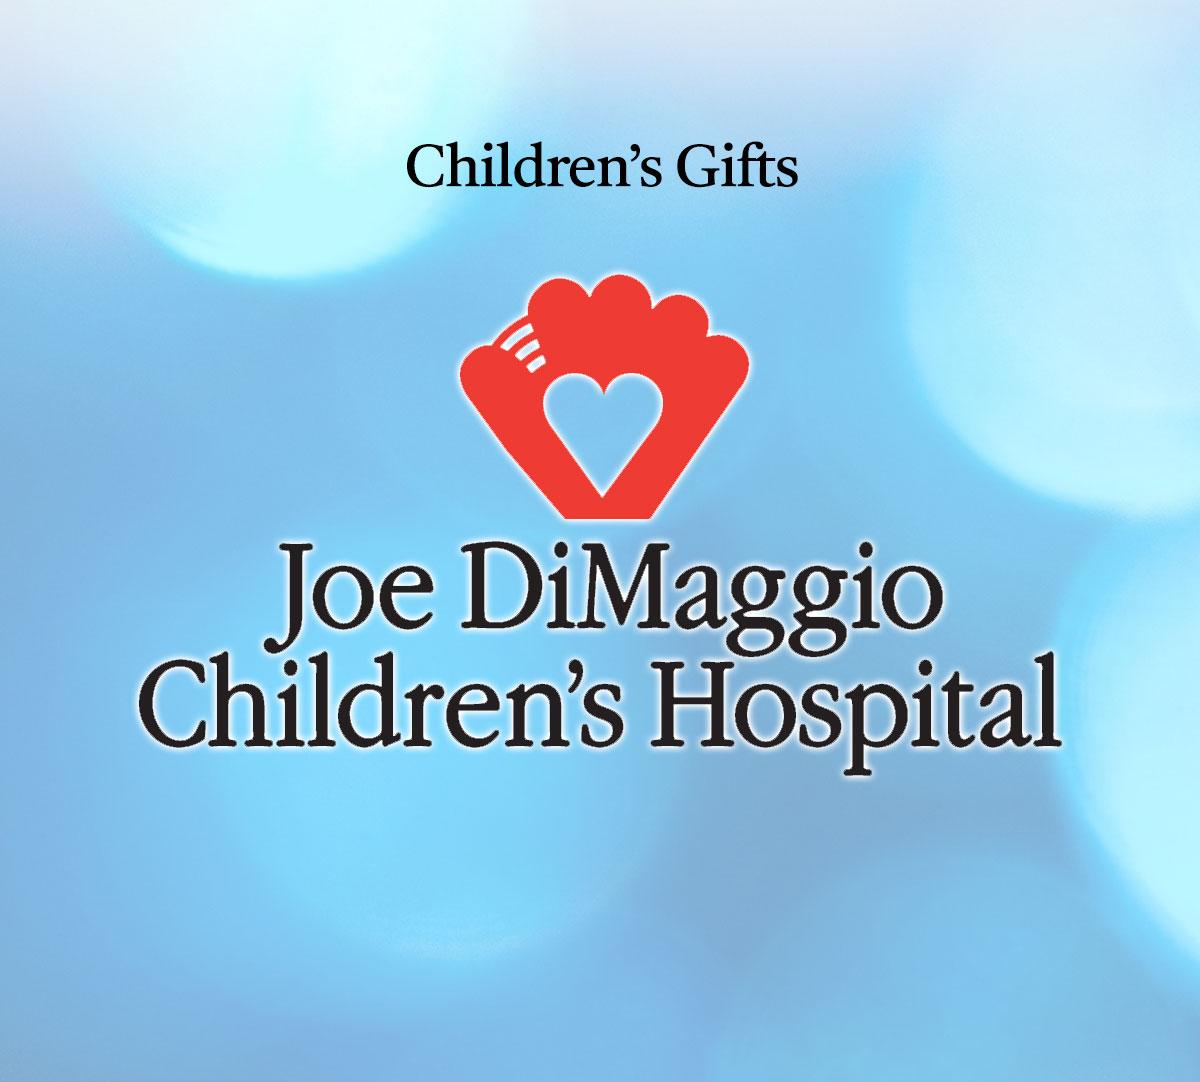 Joe DiMaggio Children's Hospital • News